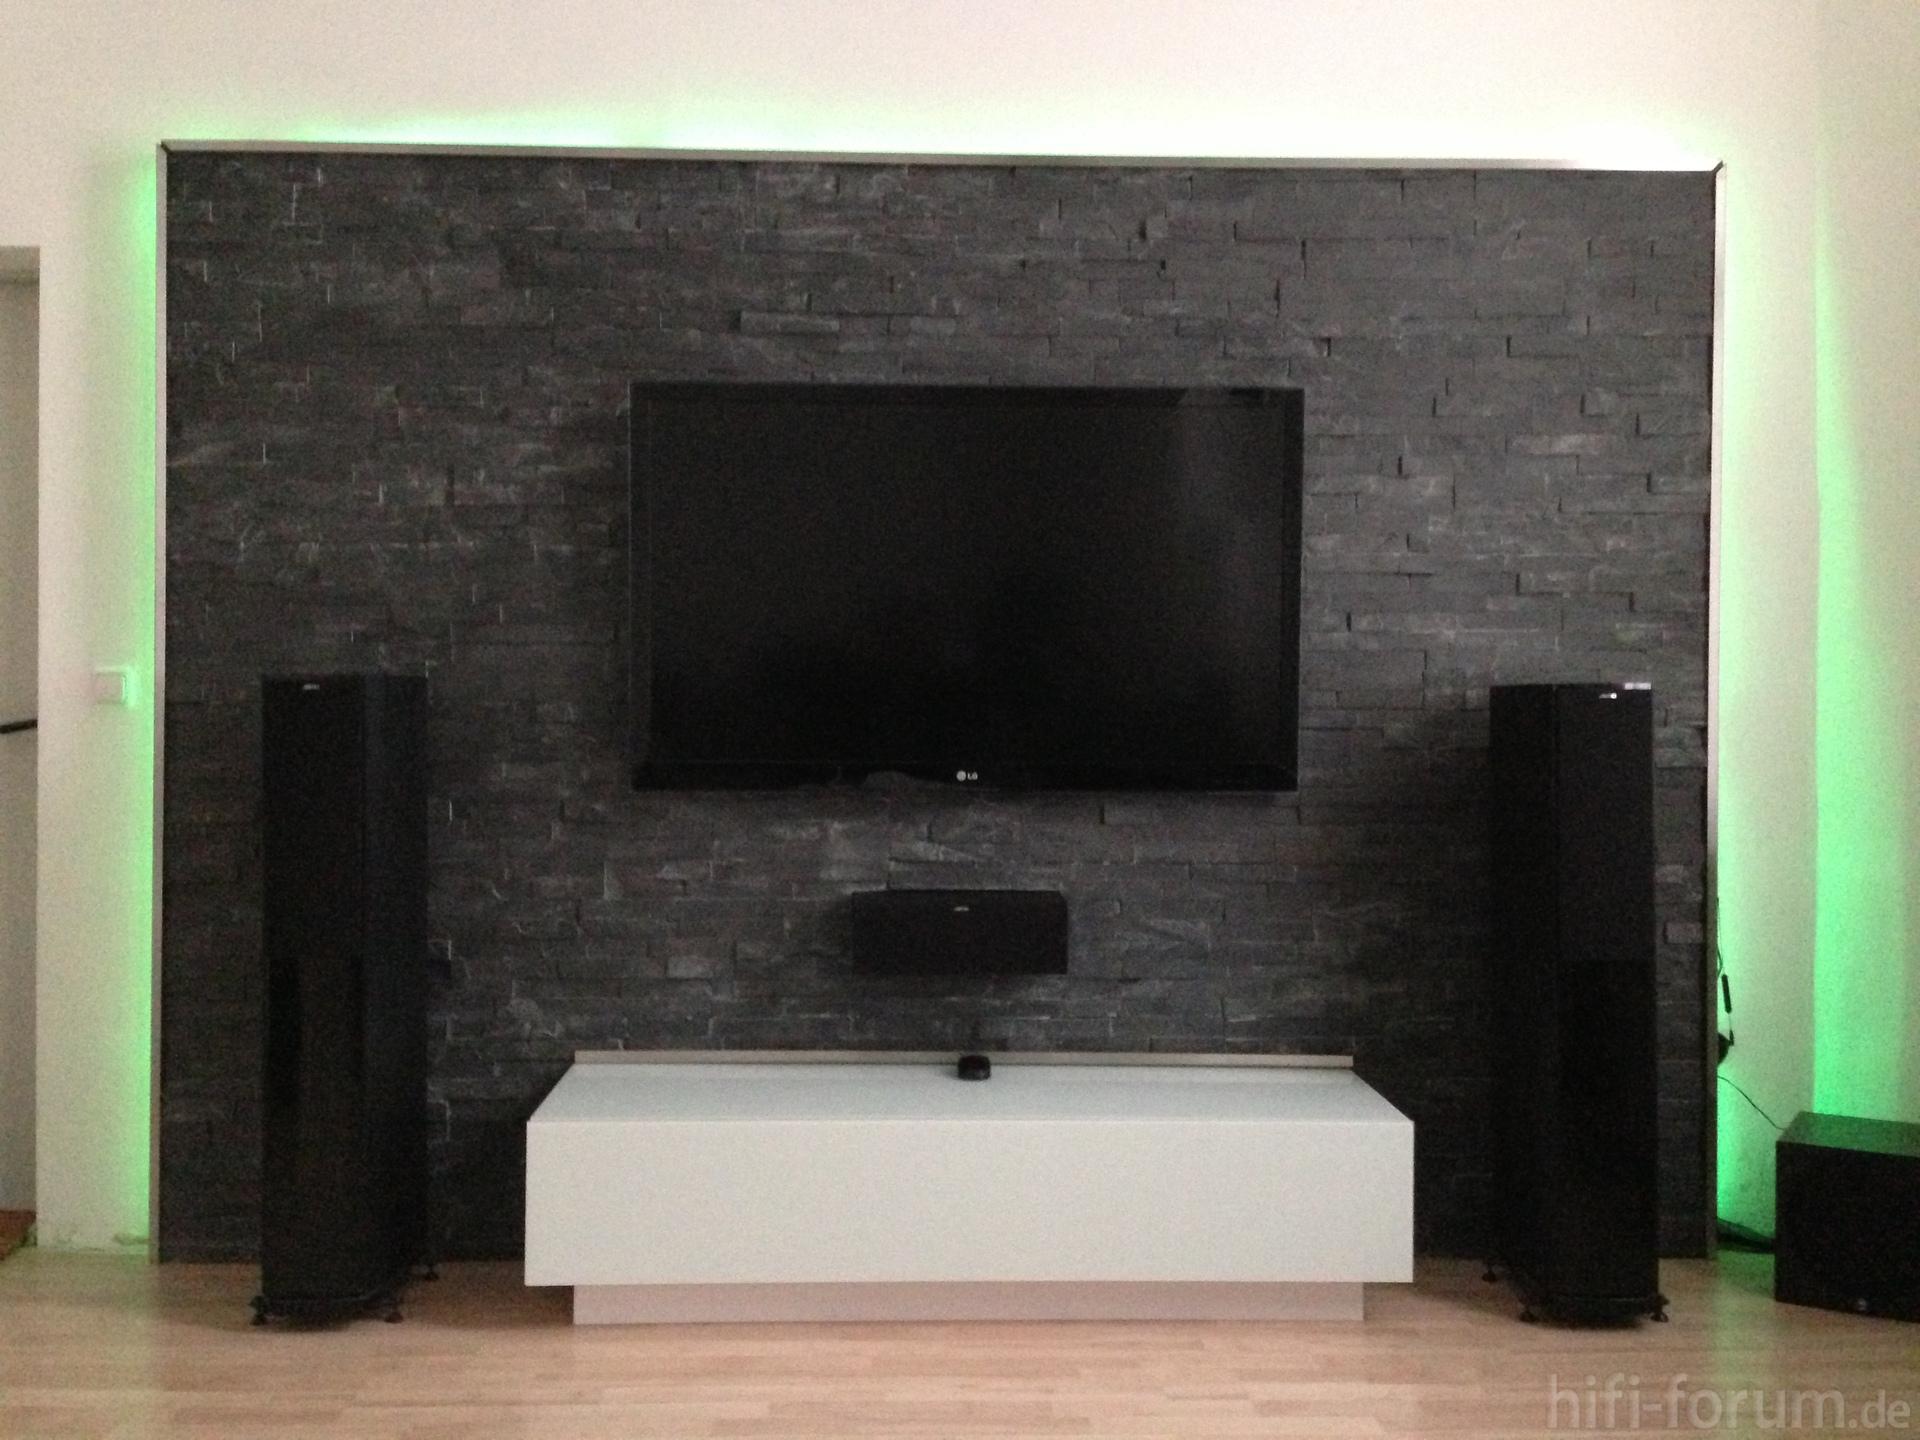 foto 3 foto hifi bildergalerie. Black Bedroom Furniture Sets. Home Design Ideas